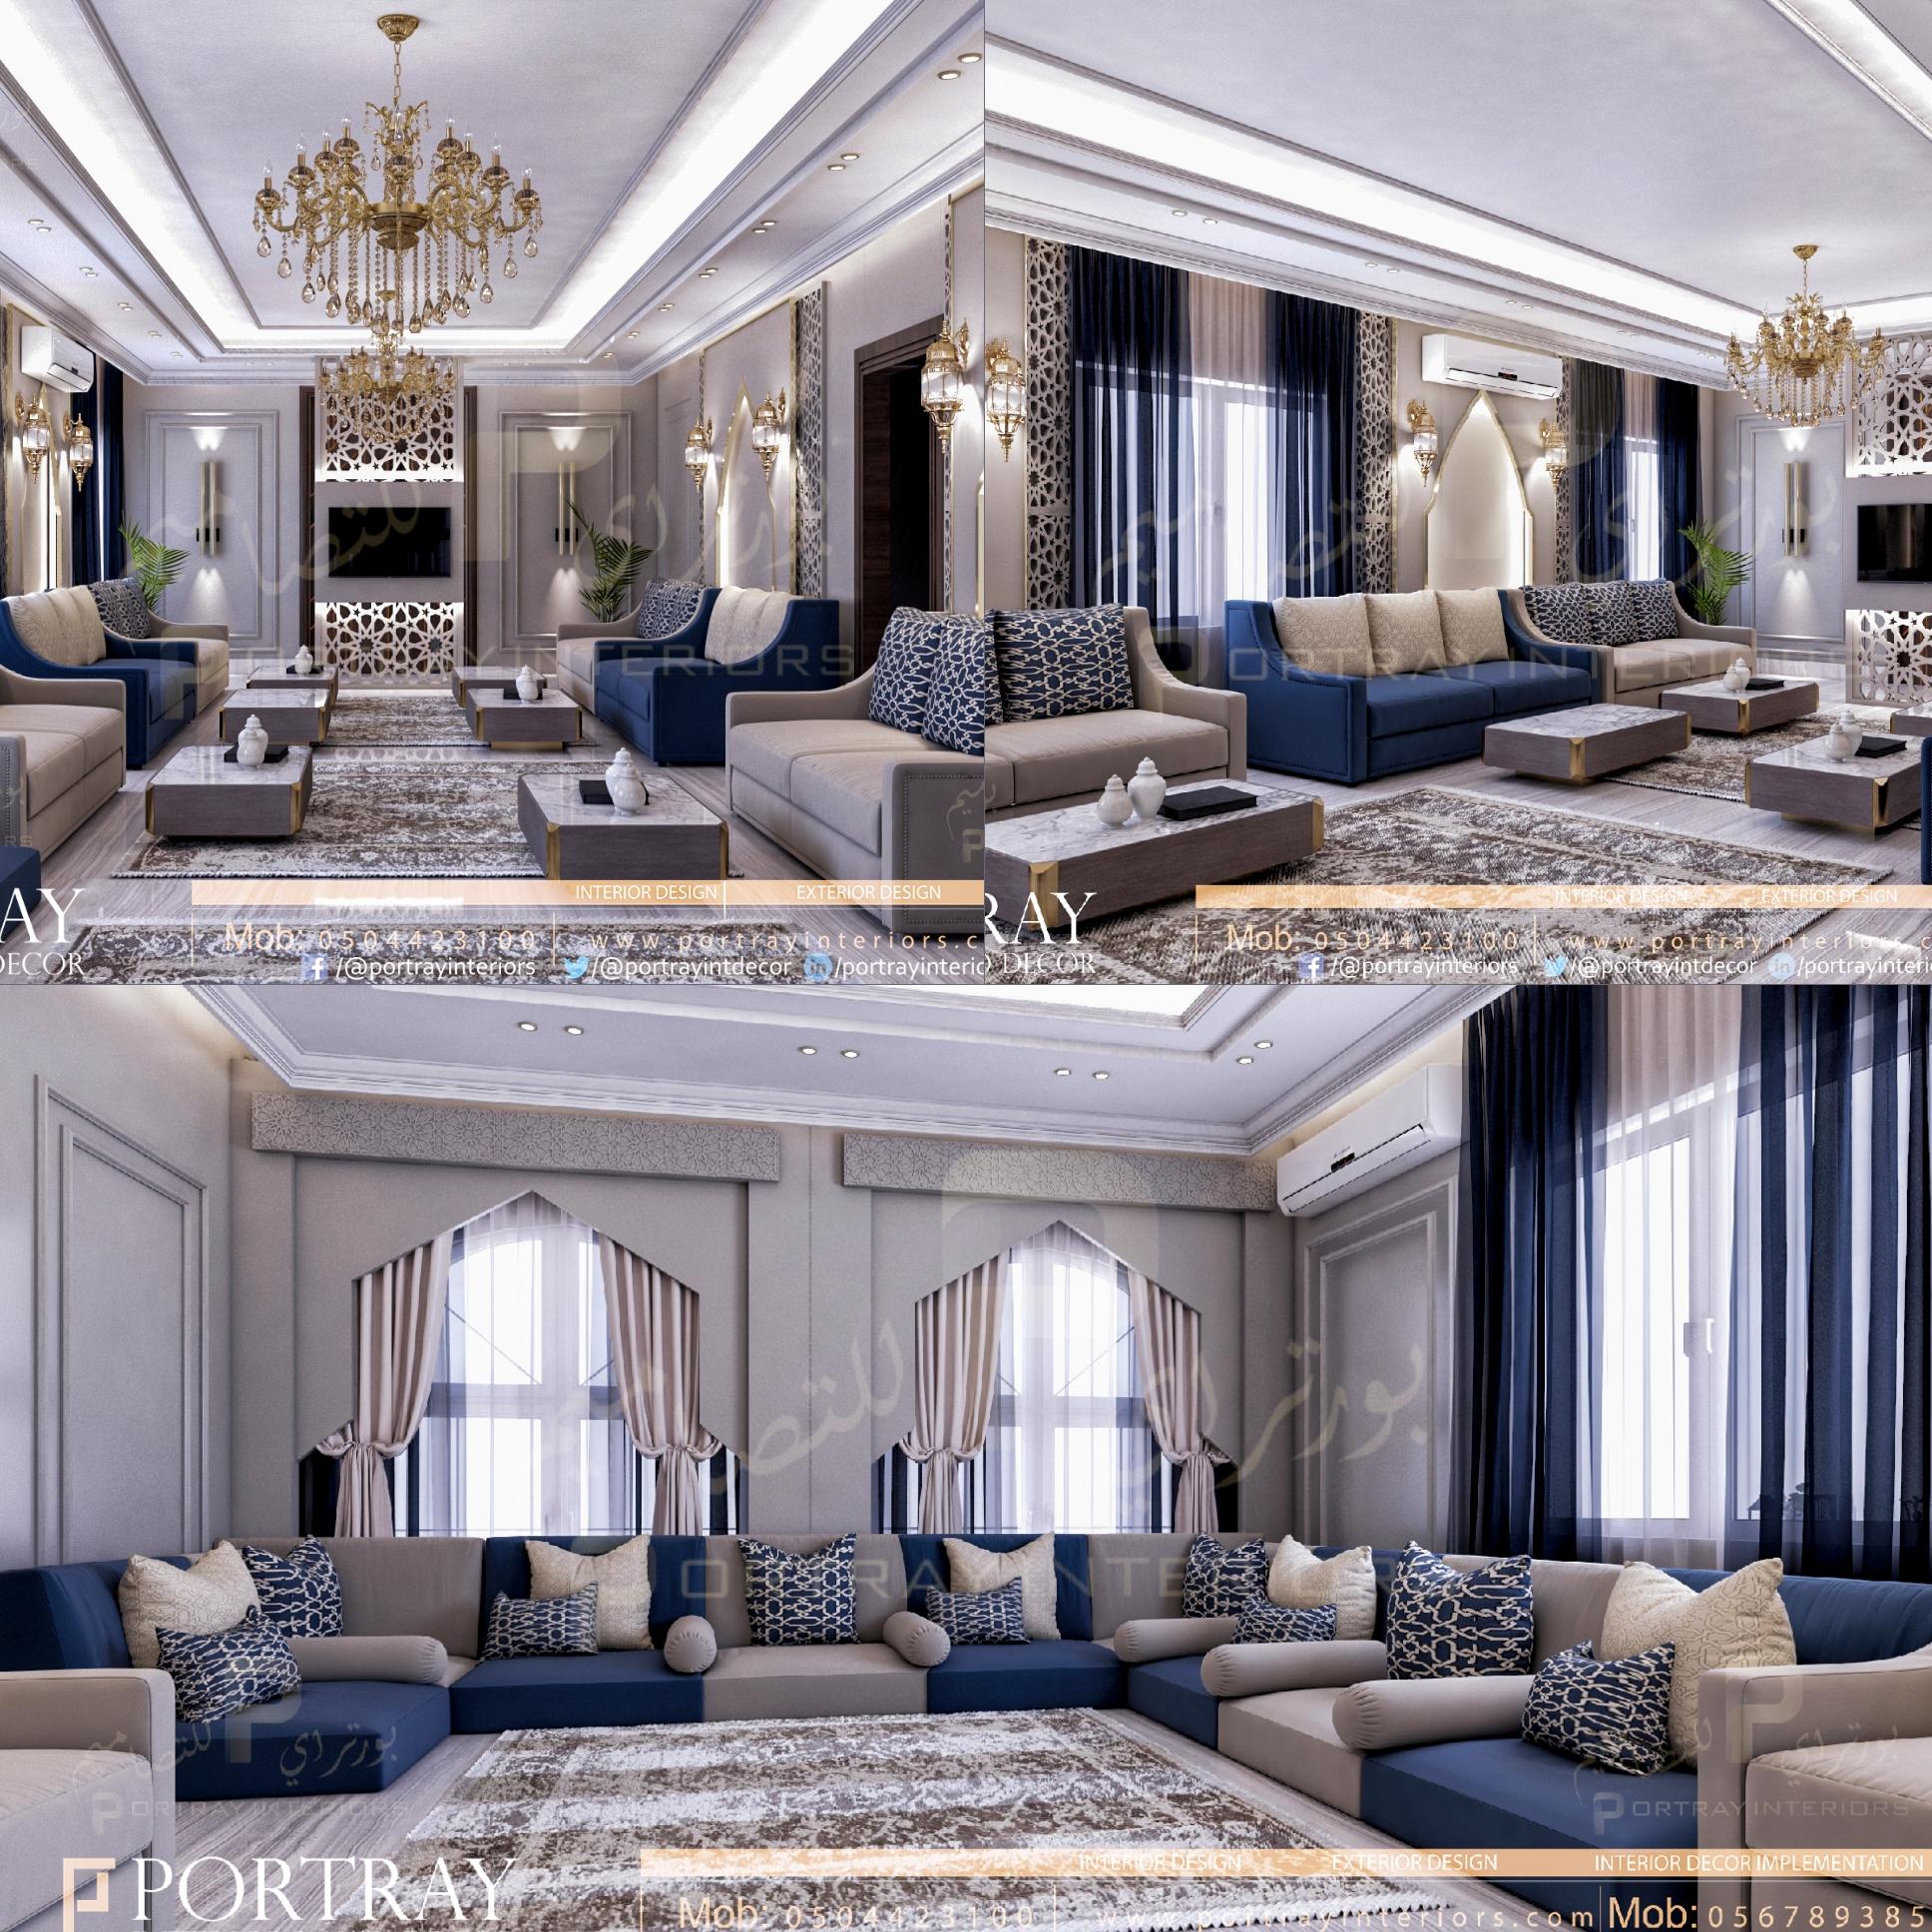 Pin On Luxury Majlis Interior Design تصميم داخلي مجلس فخم